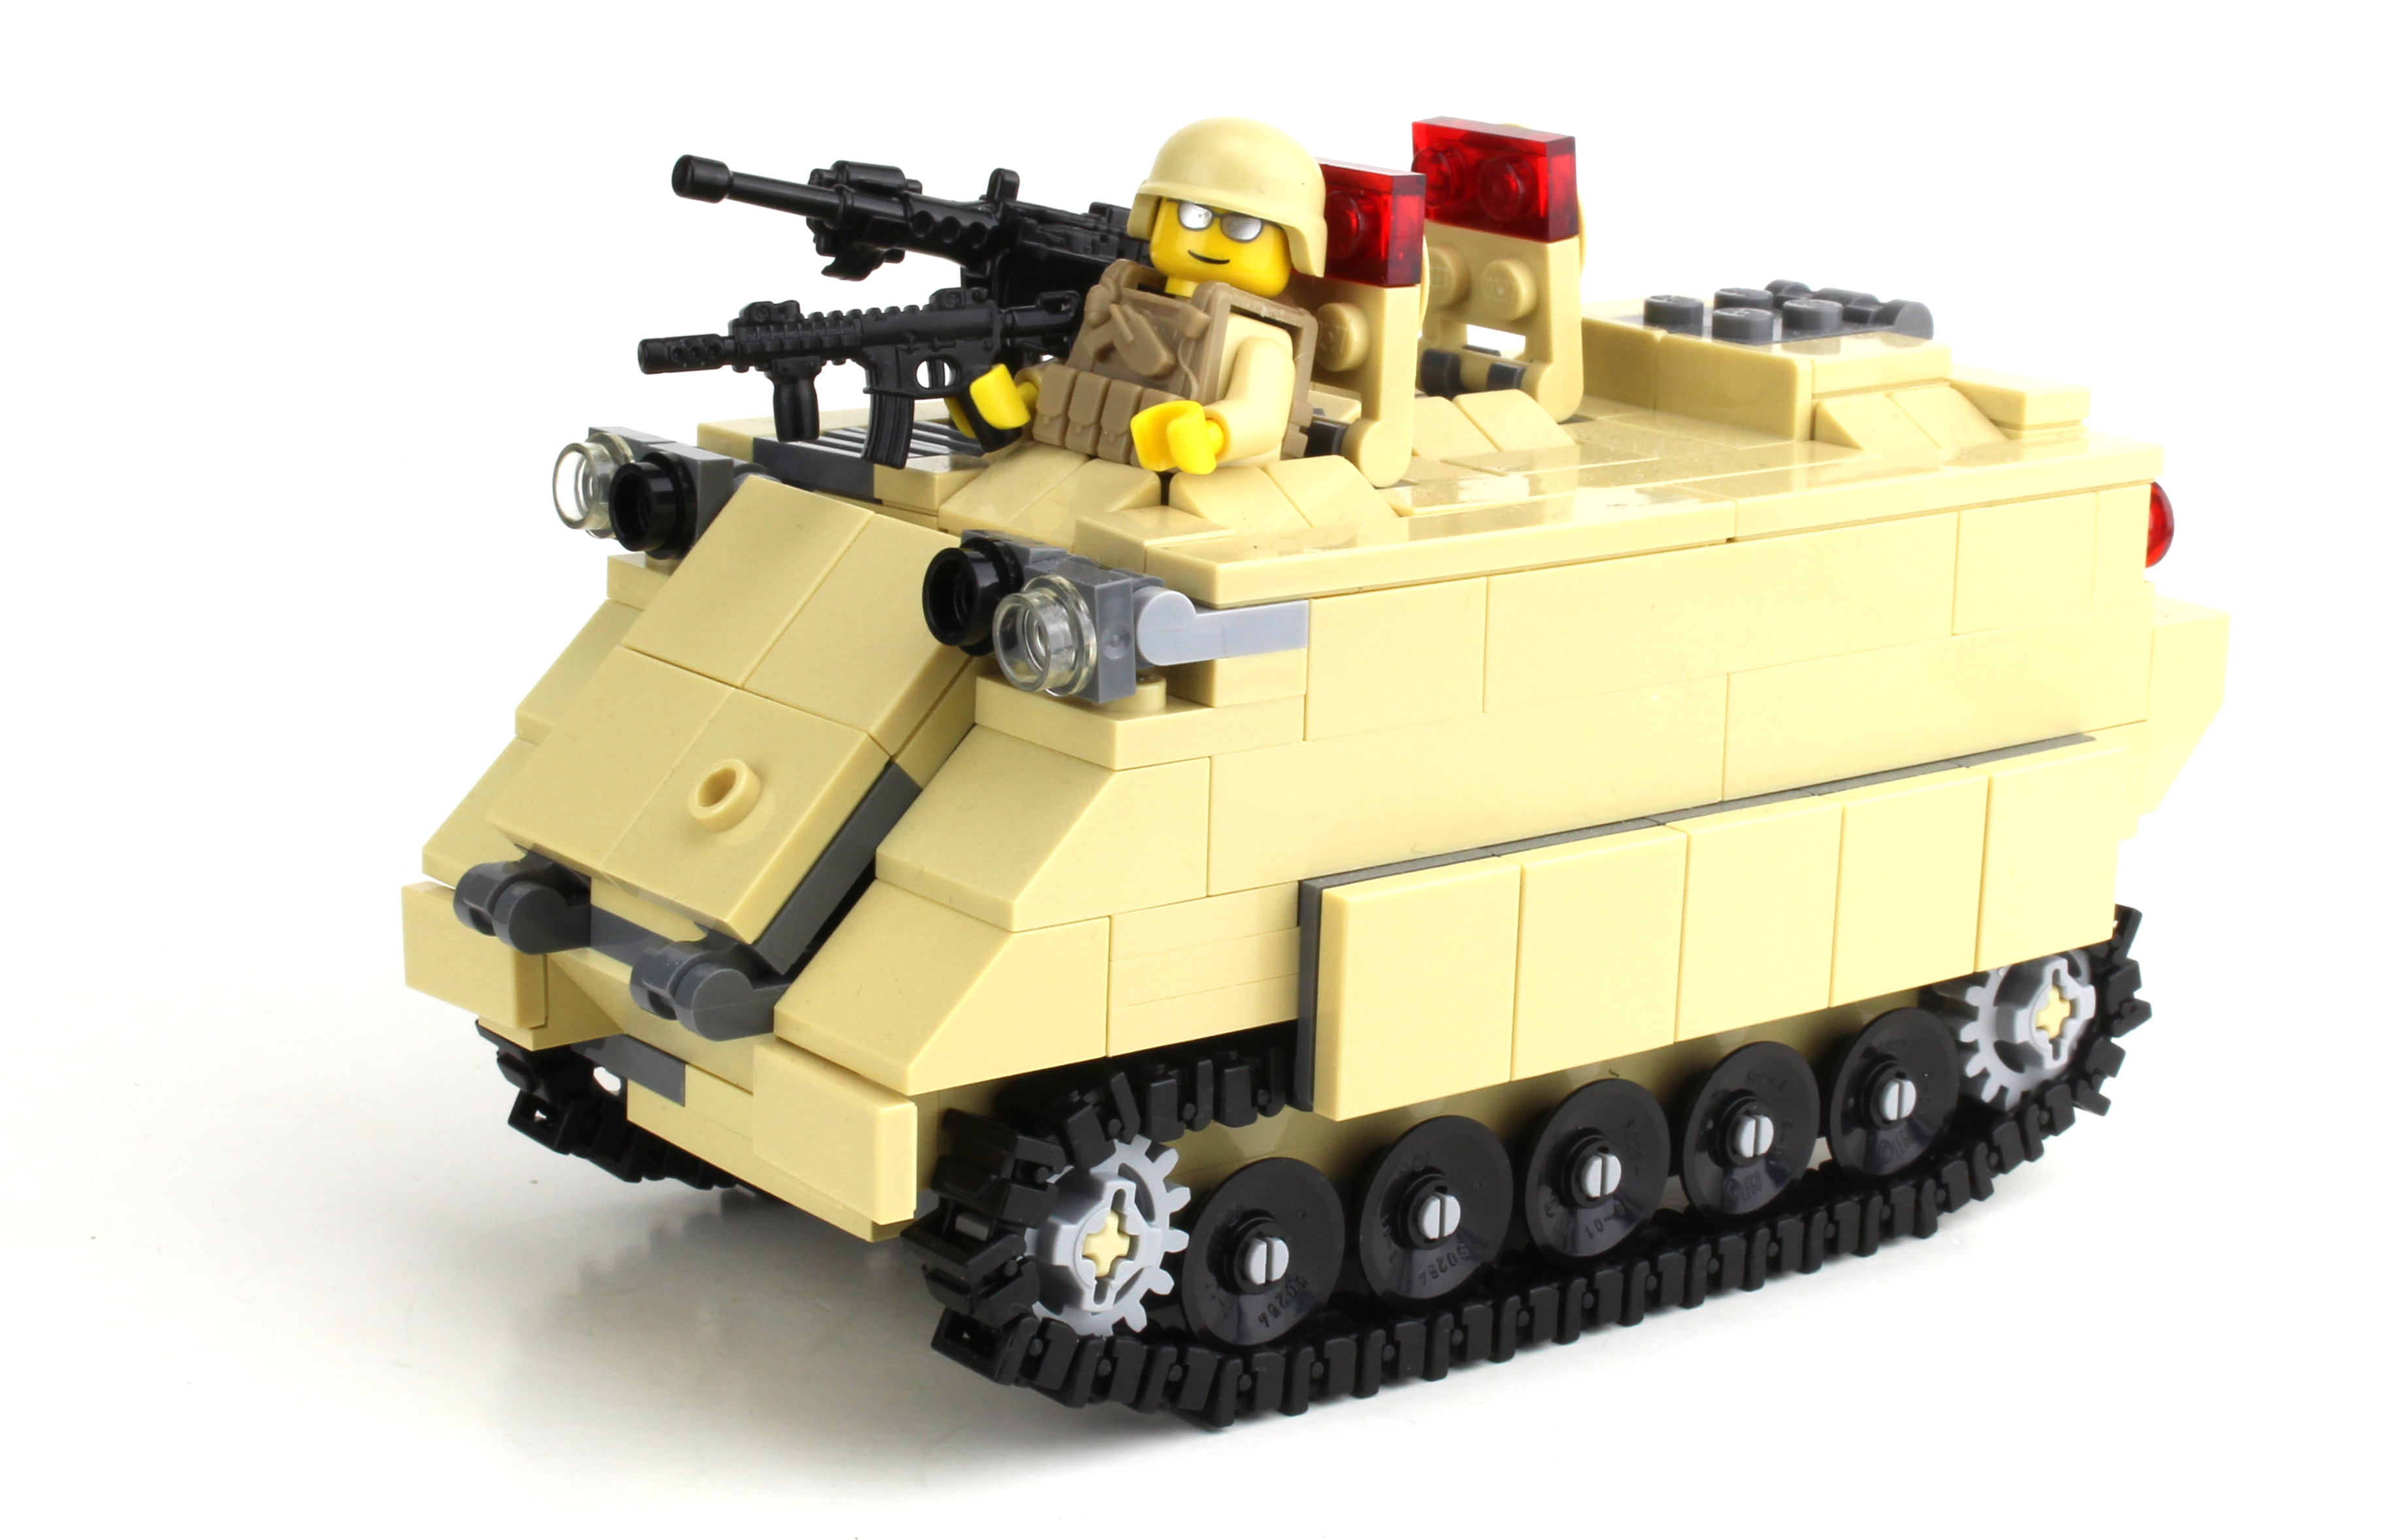 M113 Apc Army Tank Made With Real Legoa Bricks